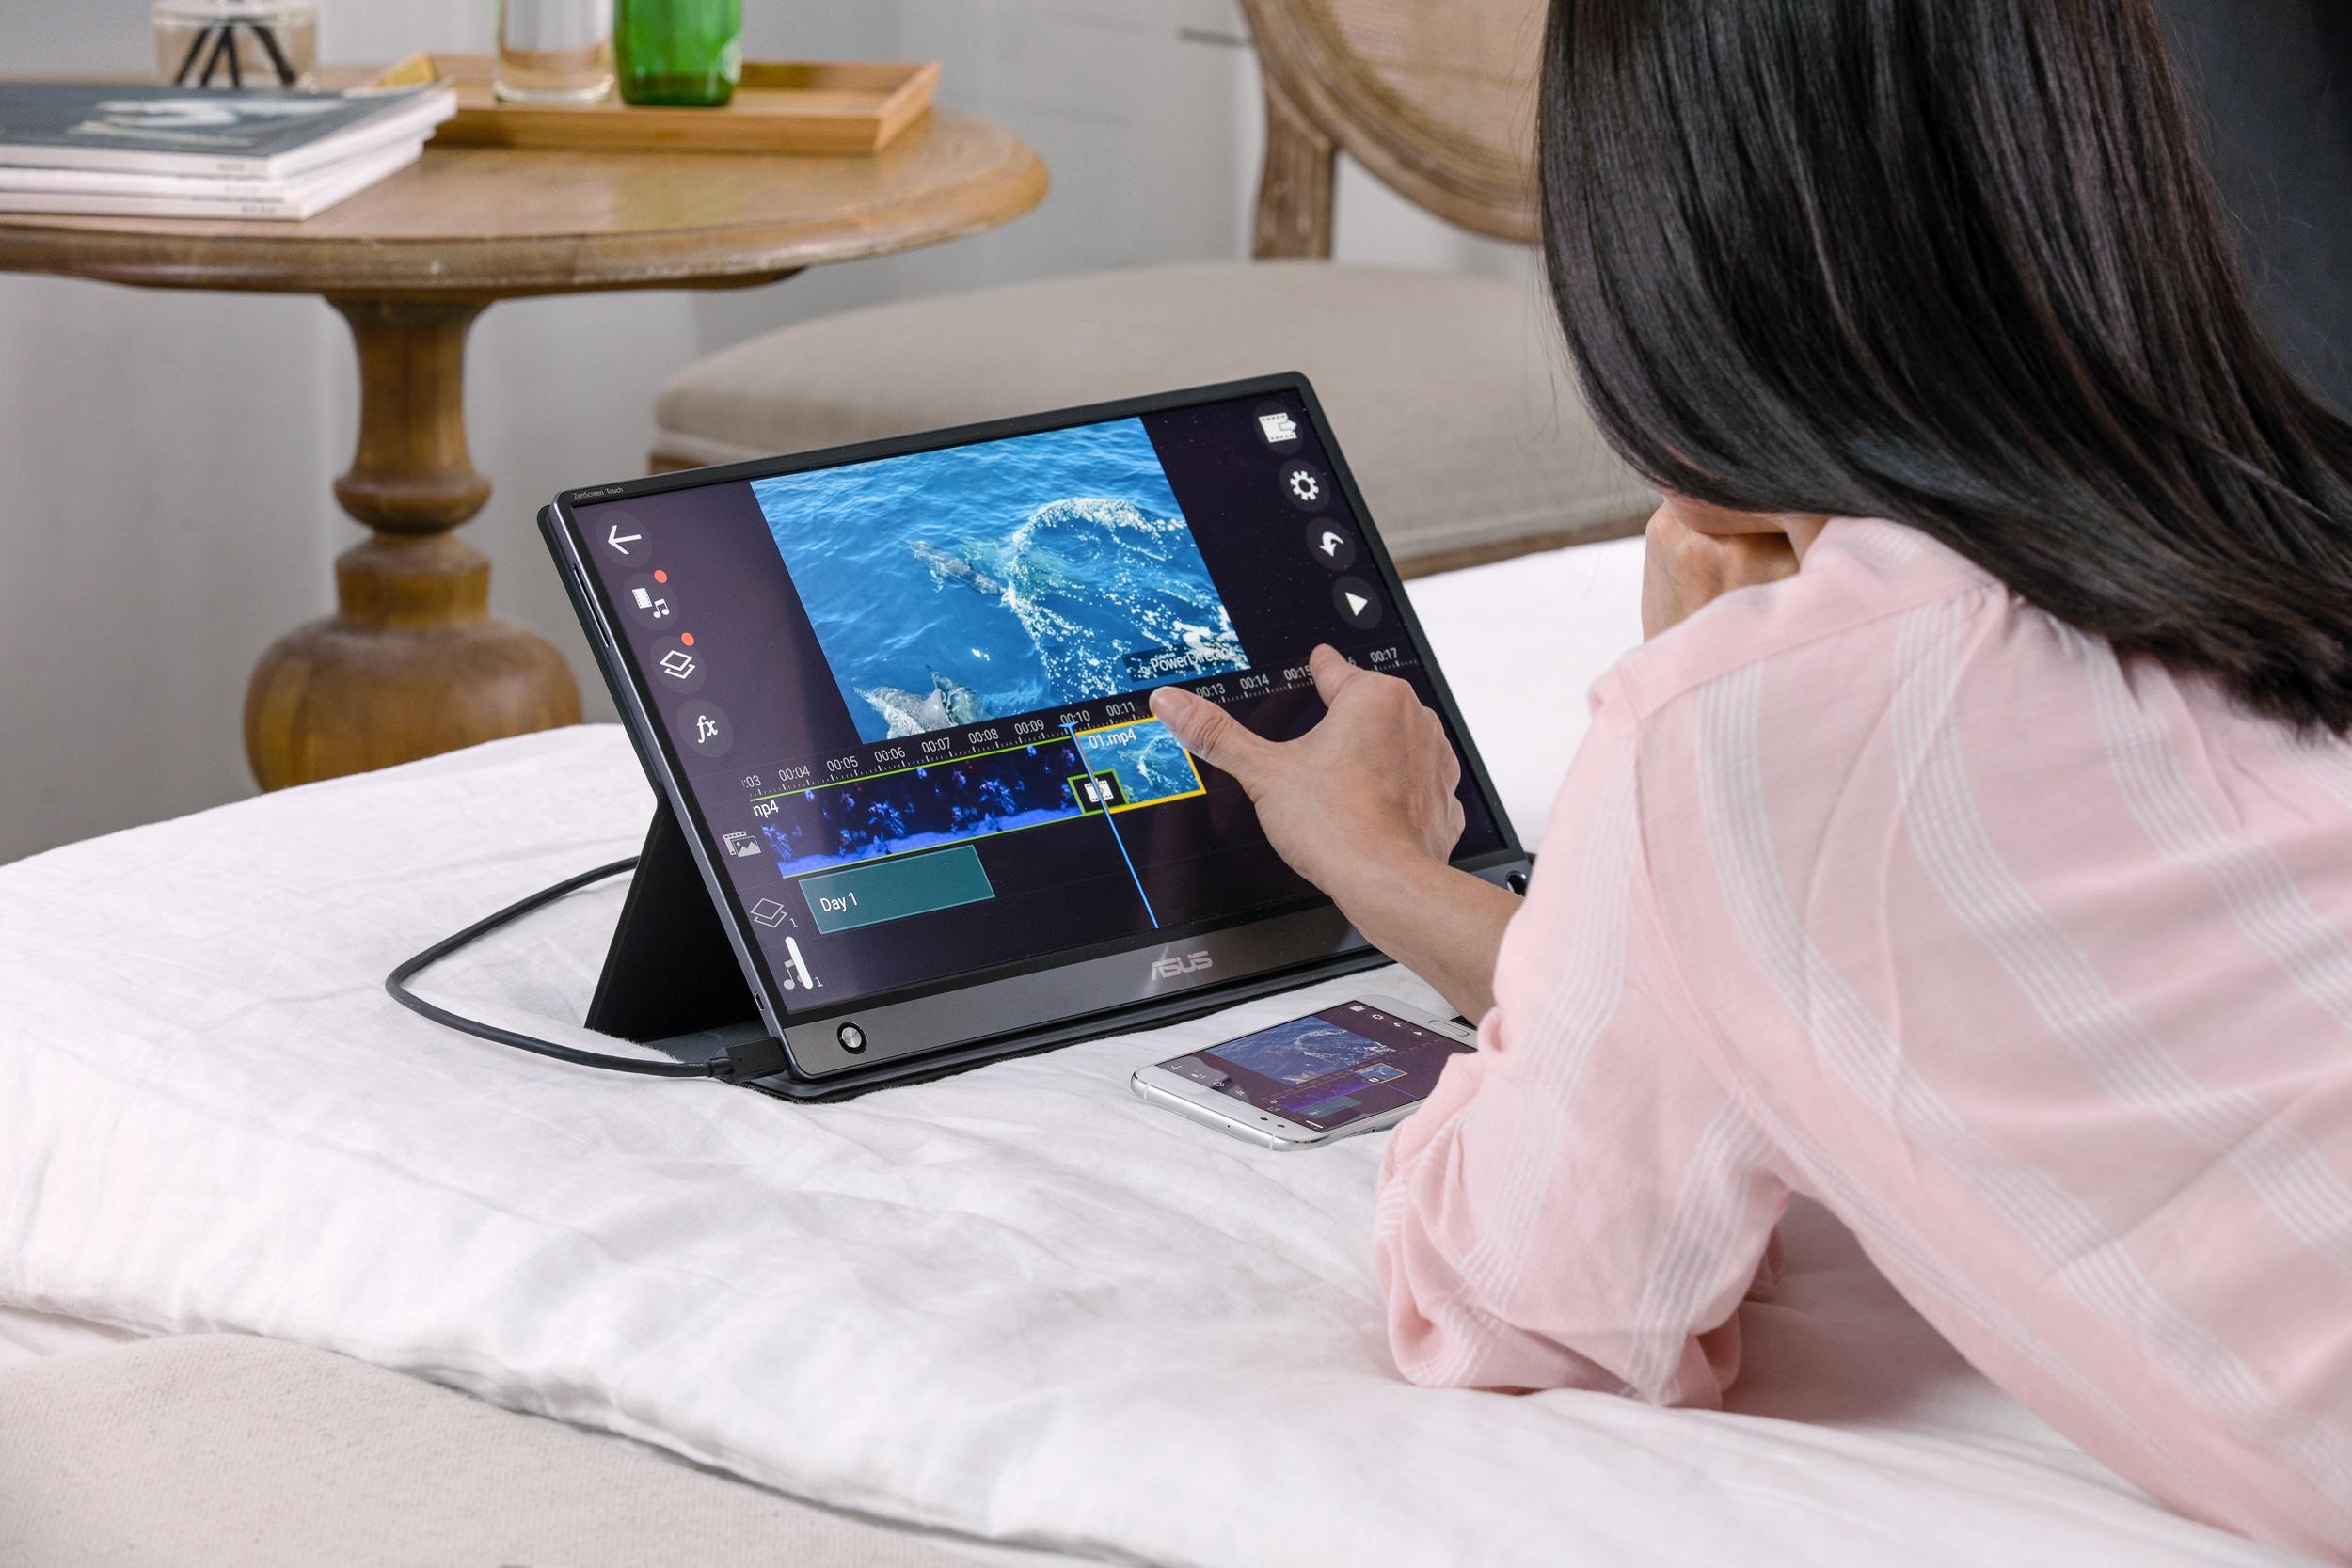 ZenScreen Touch應用程式,使用者可將Android手機連結至ASUS ZenScreen Touch MB16AMT,利用大螢幕檢視與操控手機中的應用程式